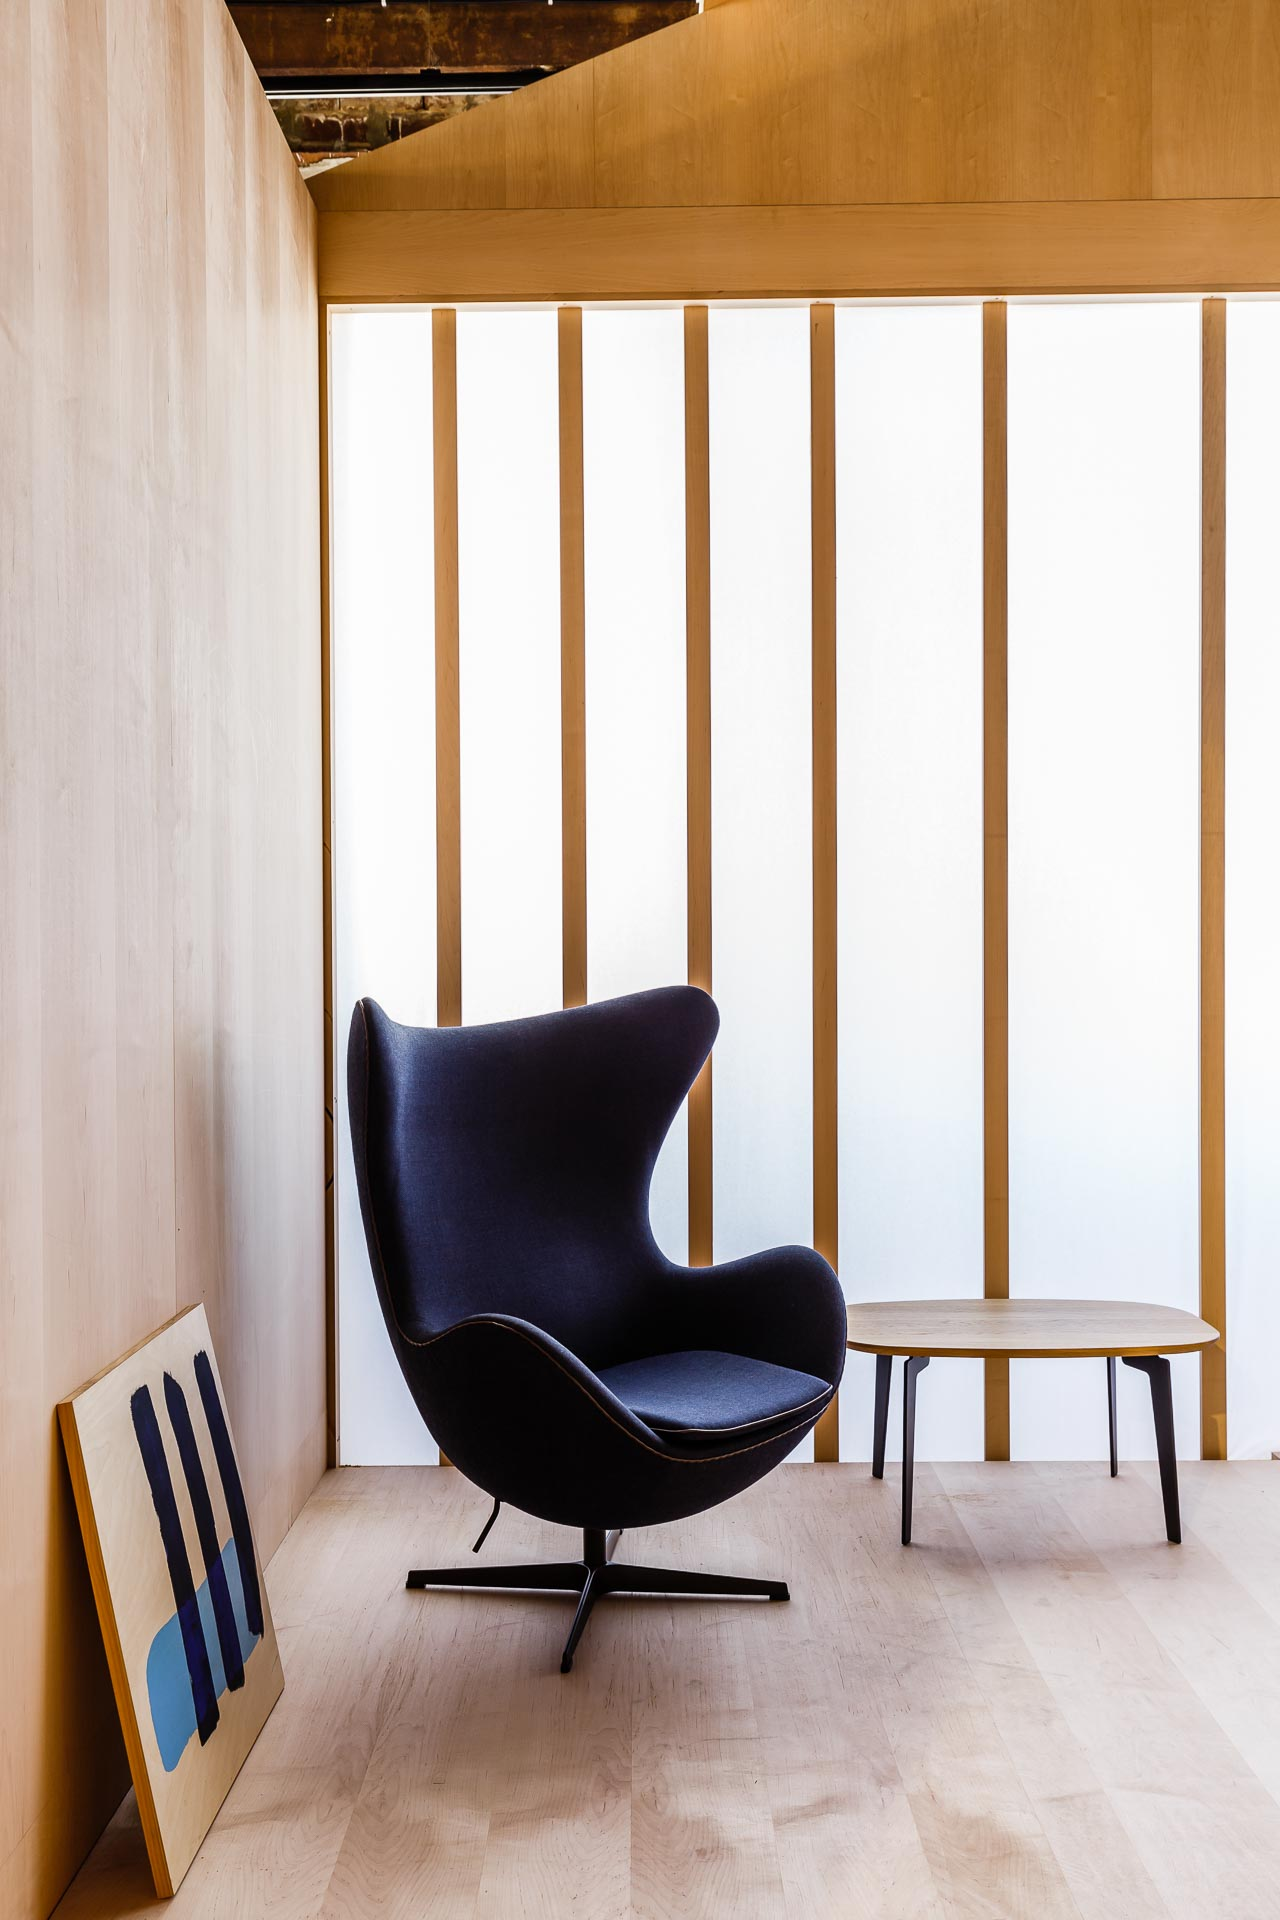 WEB - Architectural Photography Sydney - Open House Perth 2017 - Sebastian Photography 72.jpg